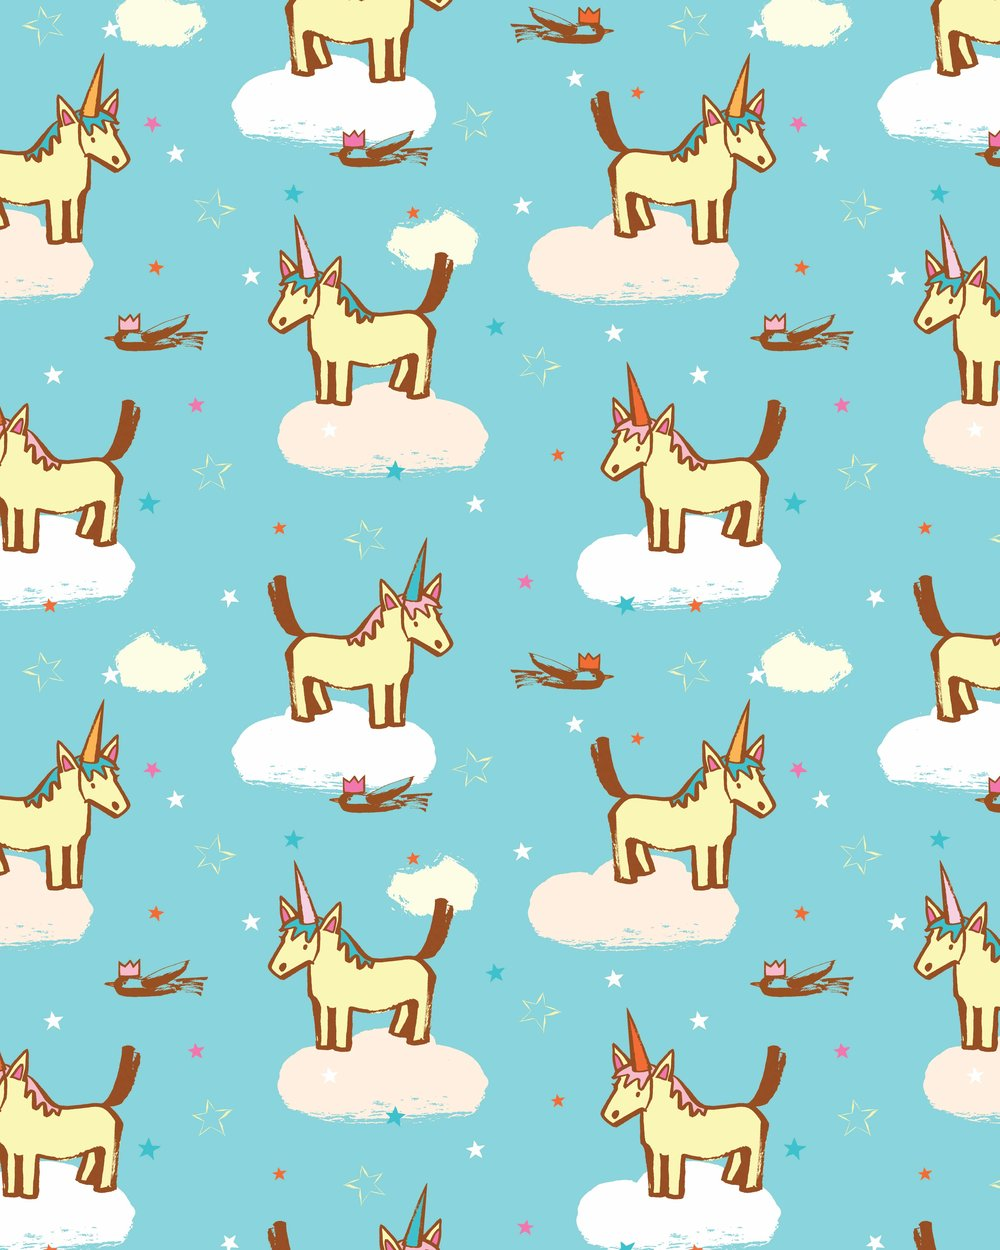 unicorn-wrapping-paper.jpg